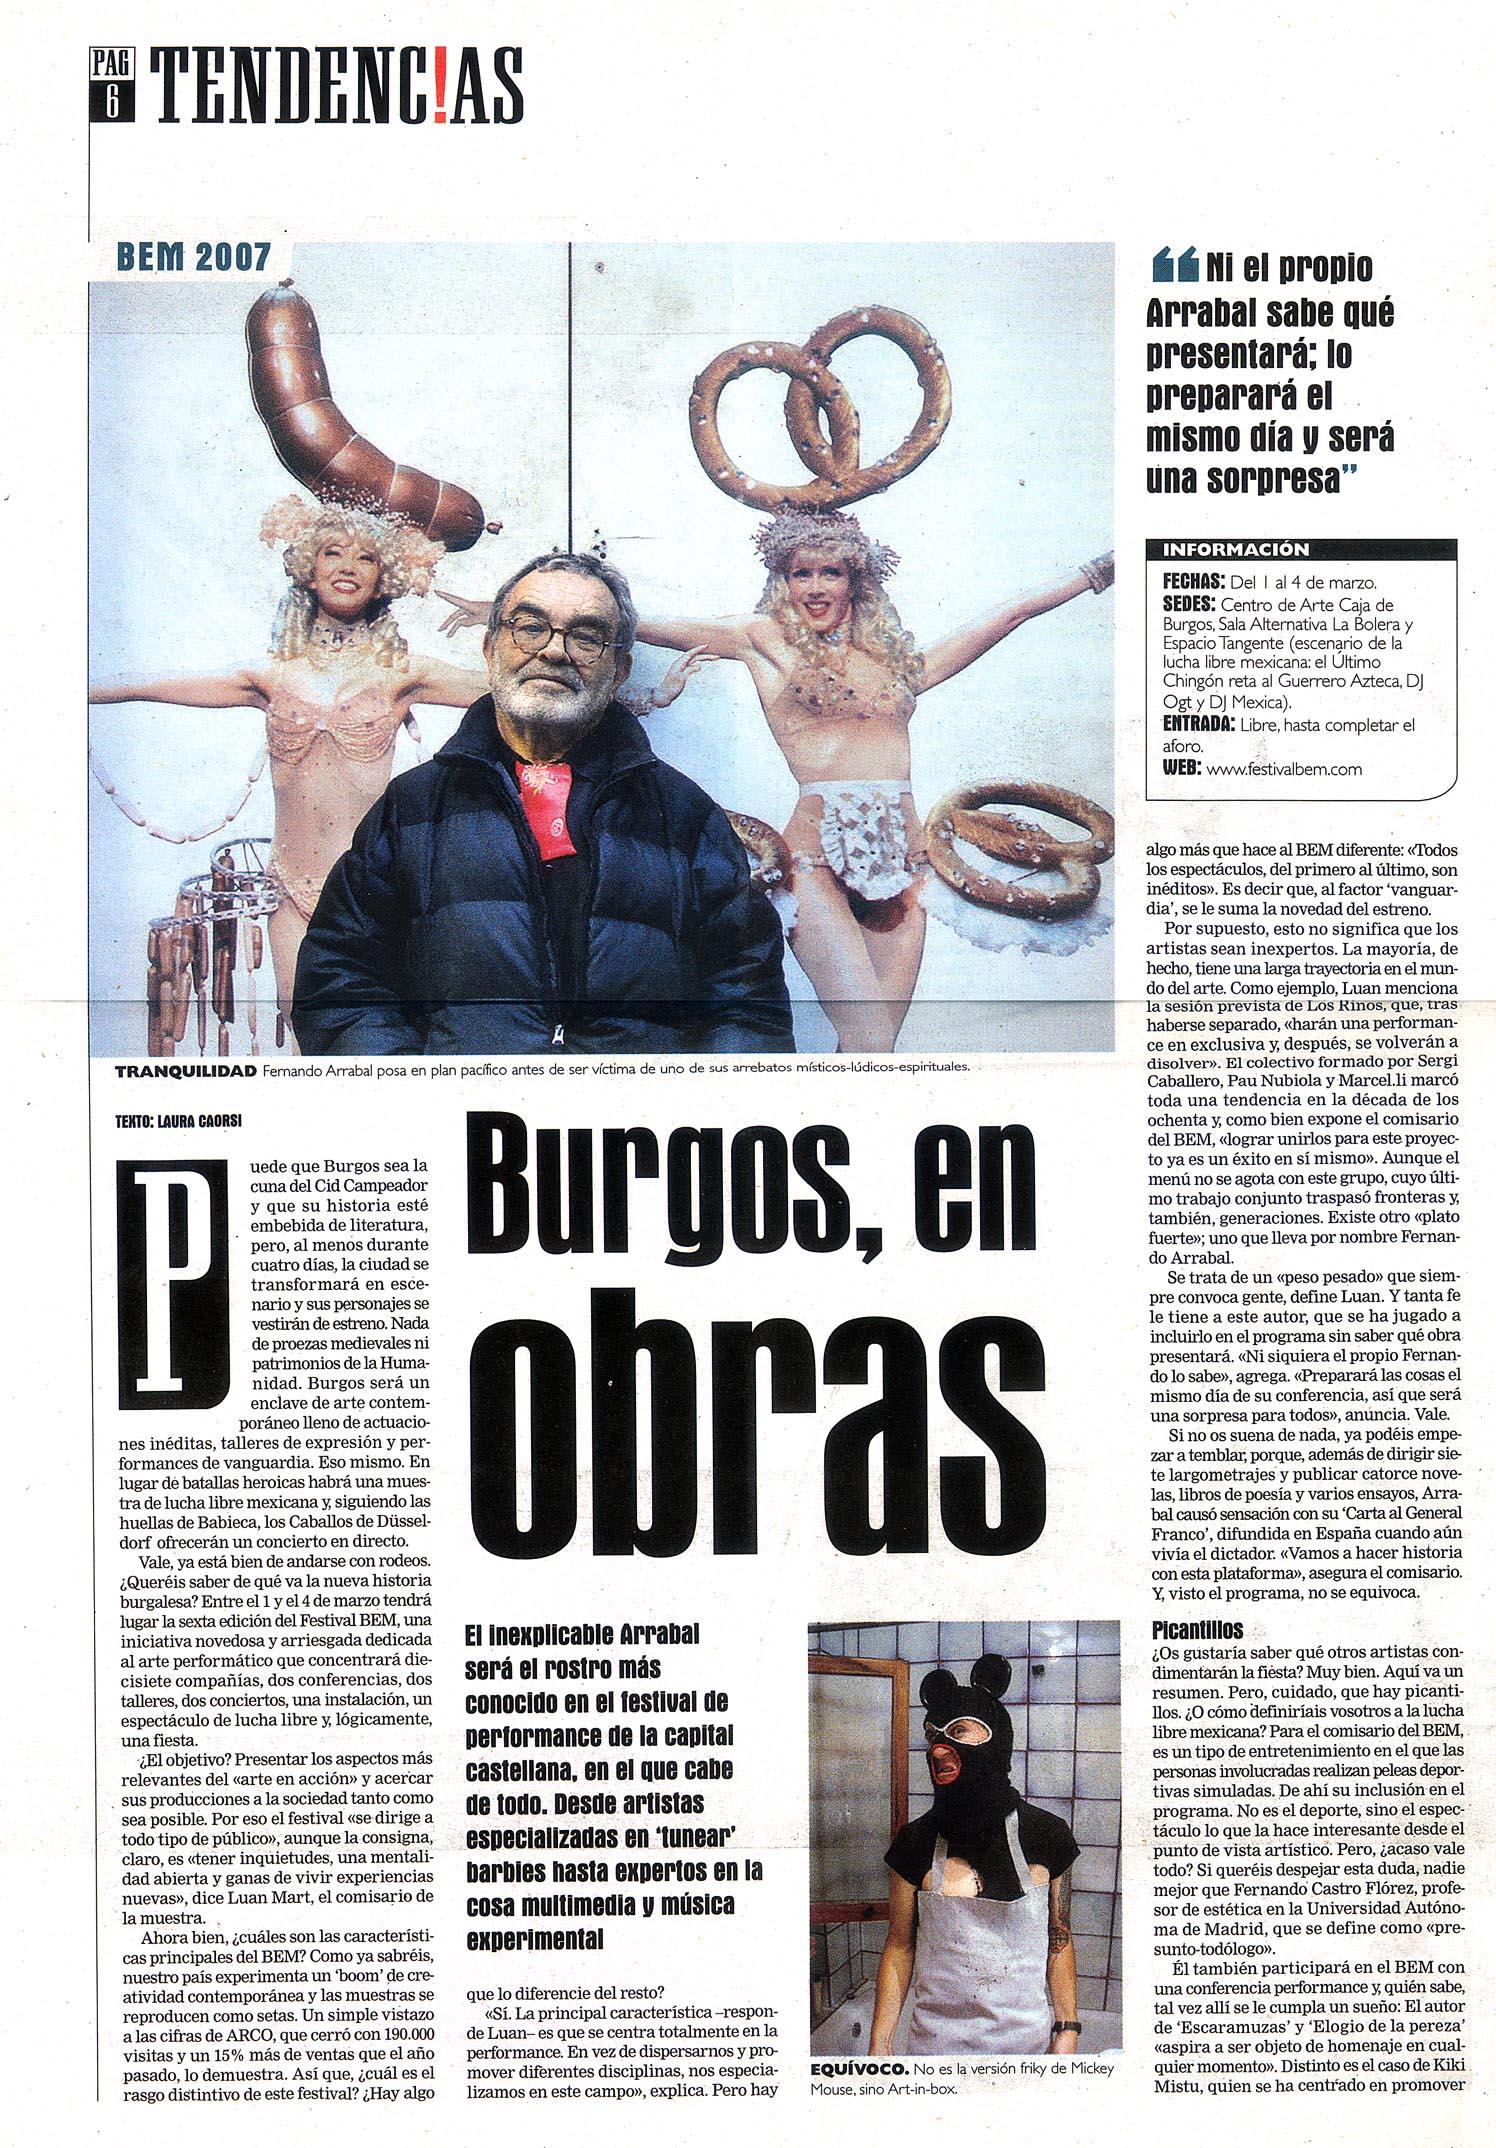 ReseñasPrensa-Evasion_Burgos_23feb2007_Pag6